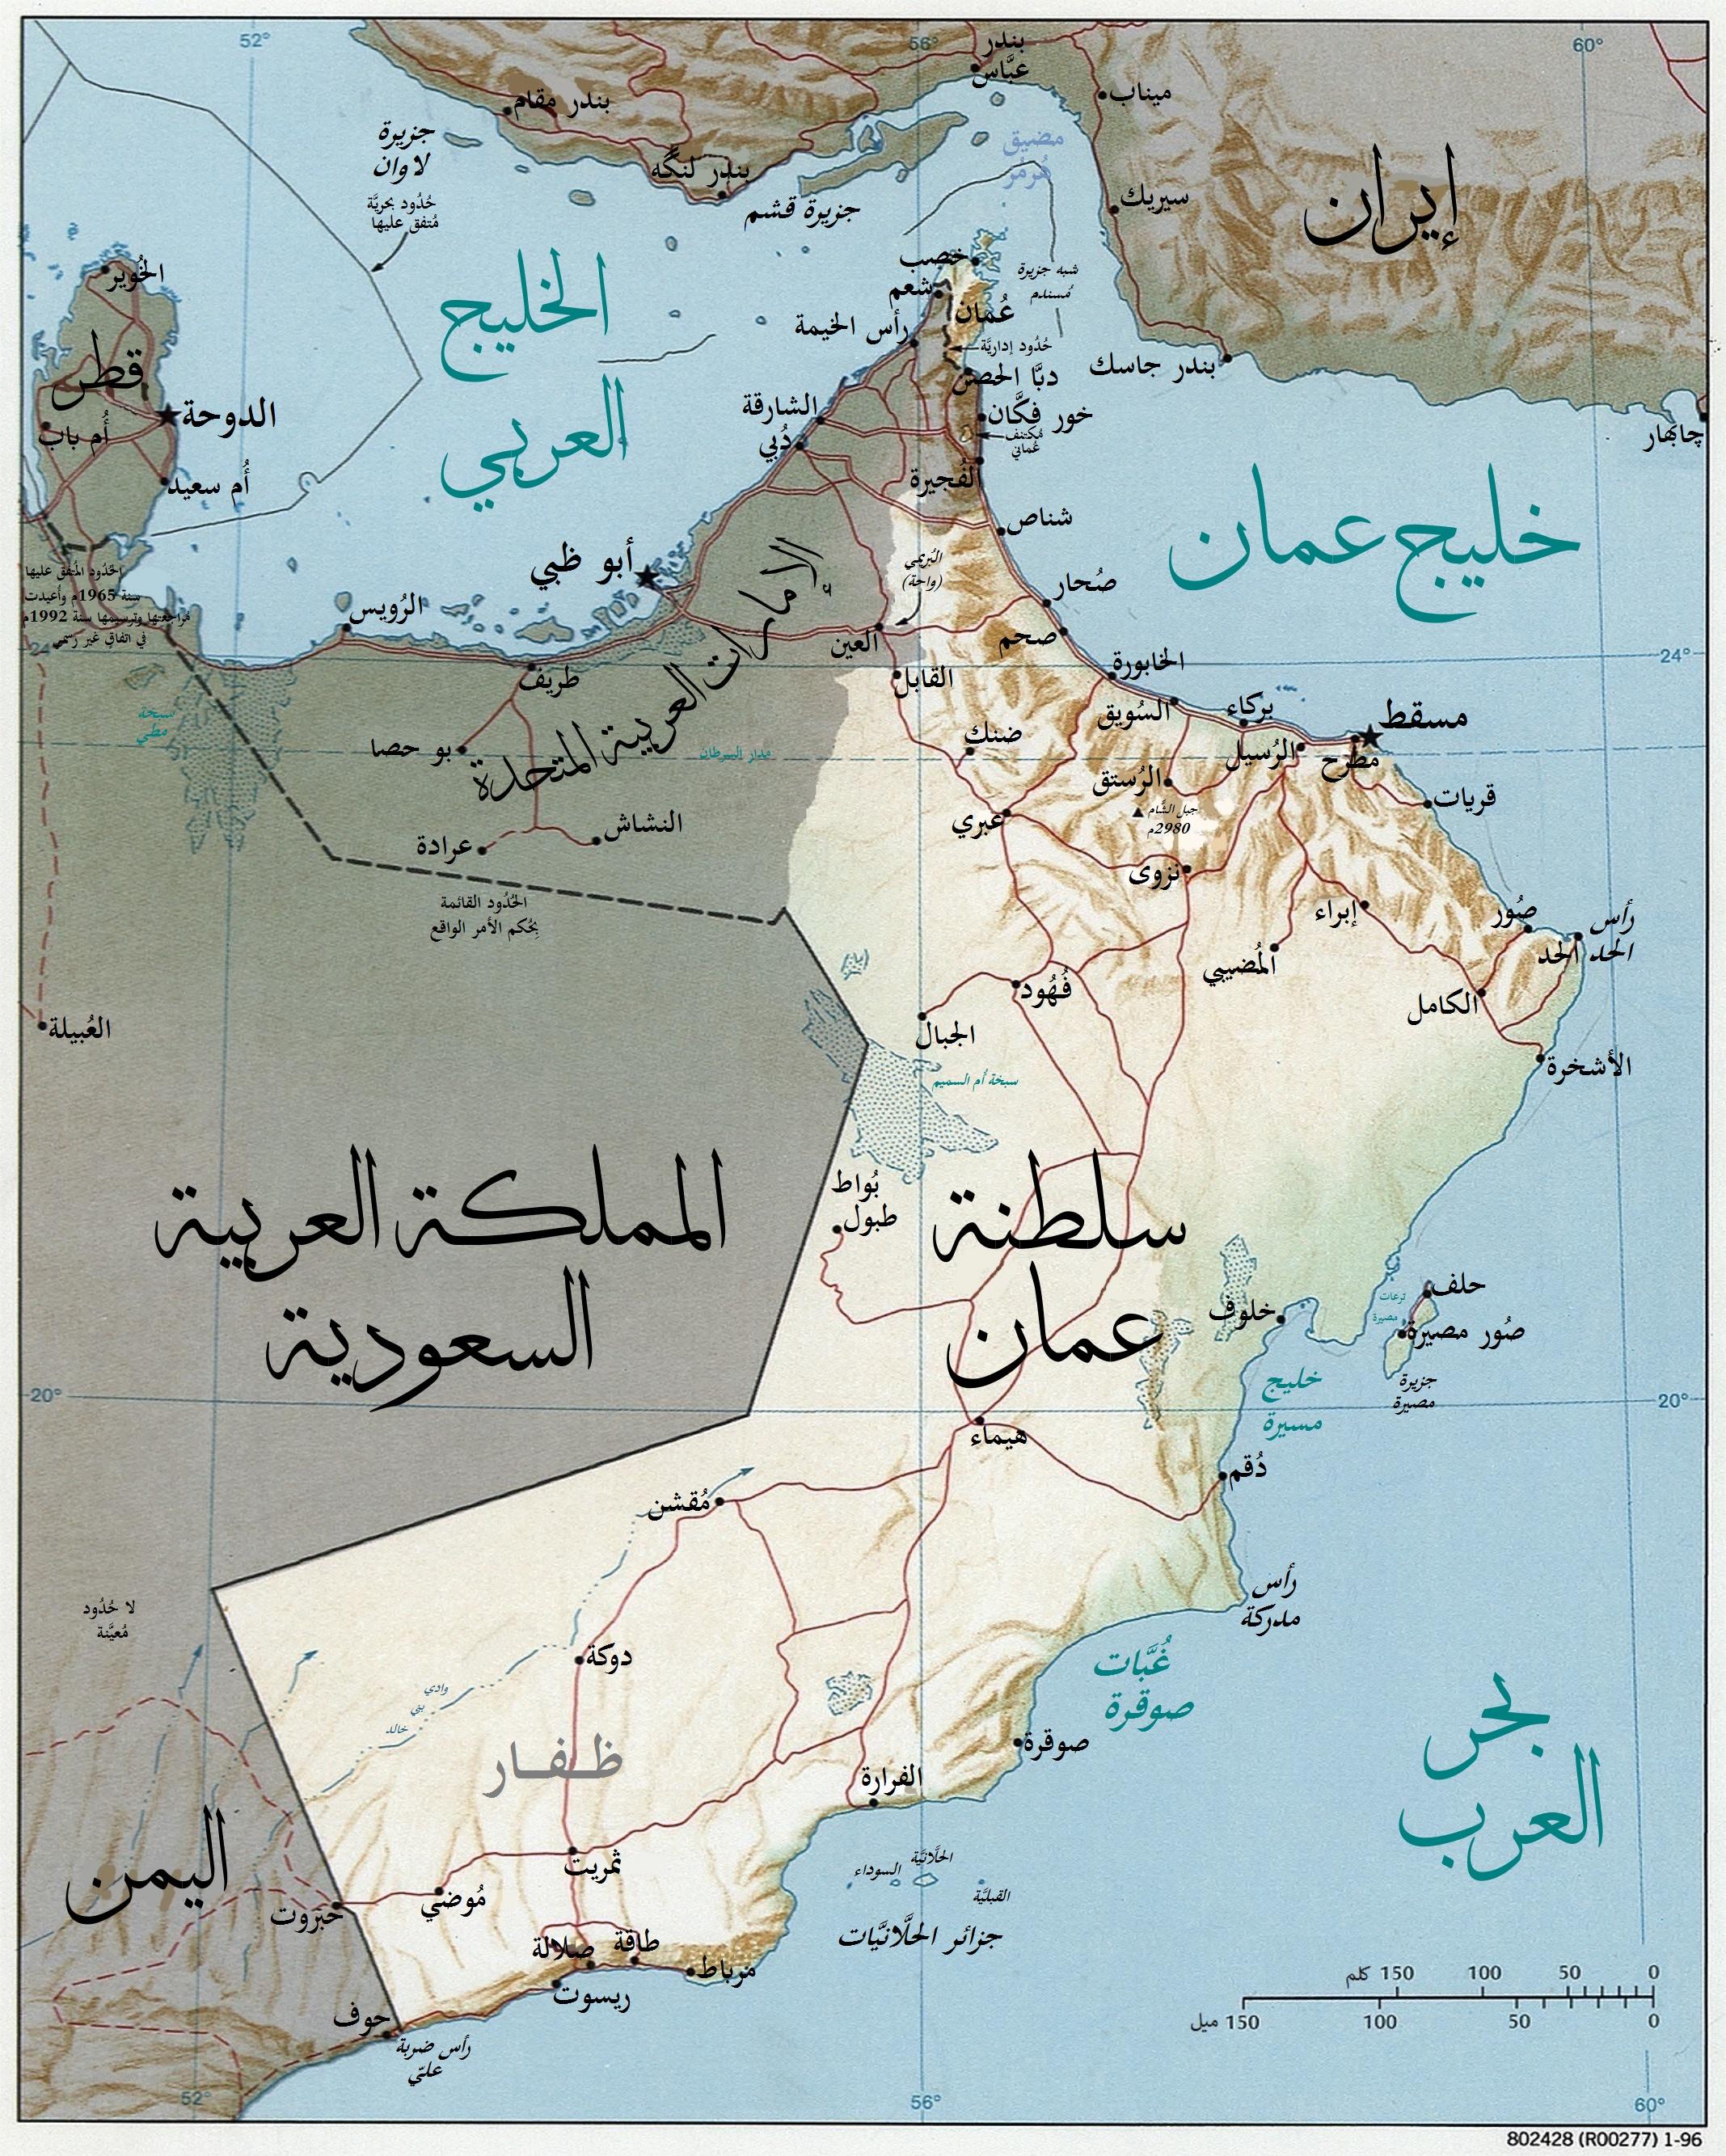 جغرافيا عمان ويكيبيديا